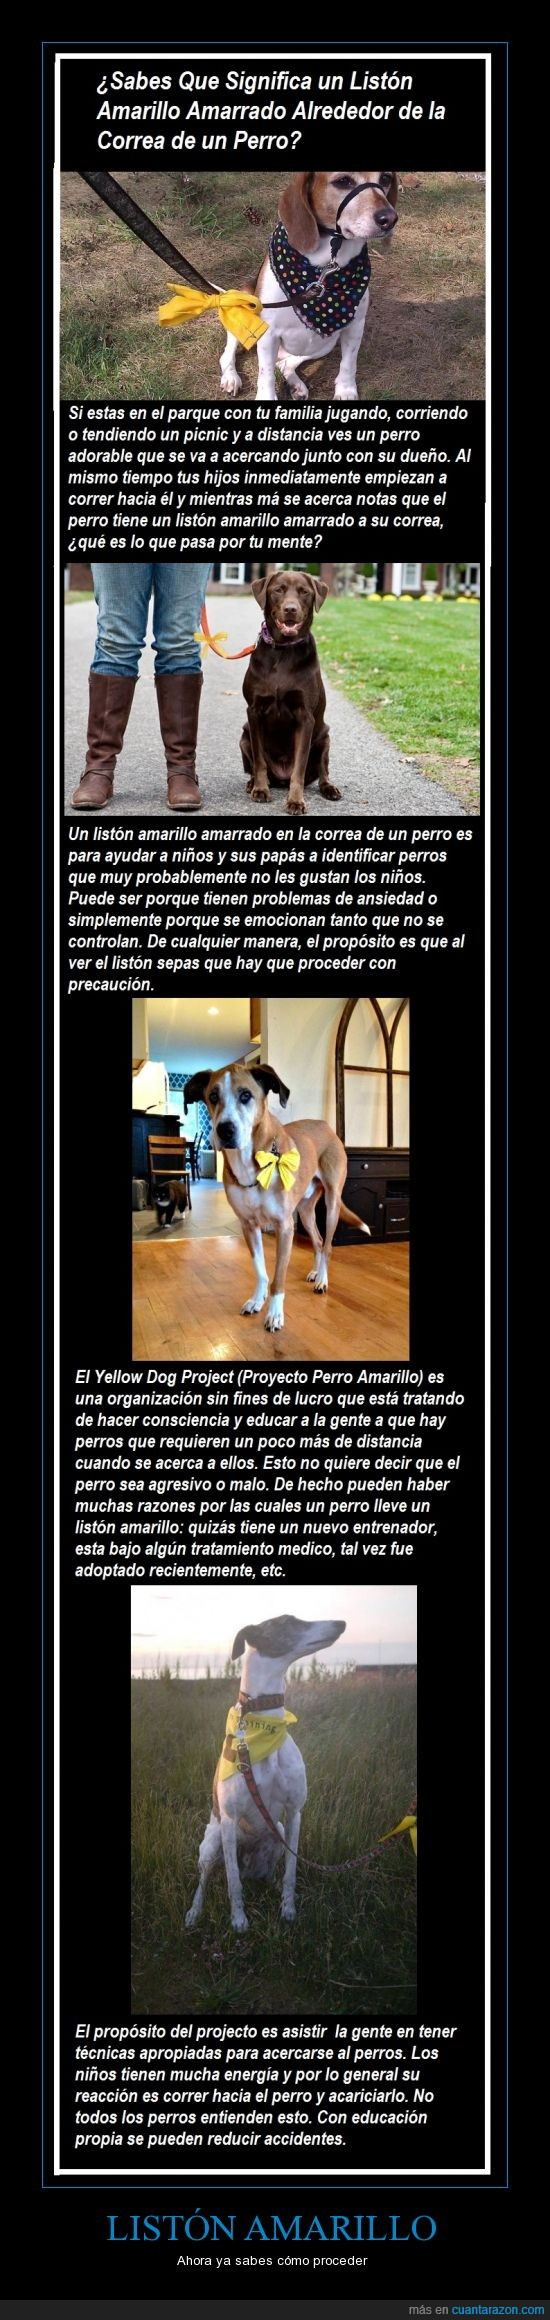 amarillo,cinta,informarse es prevenir accidentes,lazo,liston,pañuelo,proyecto